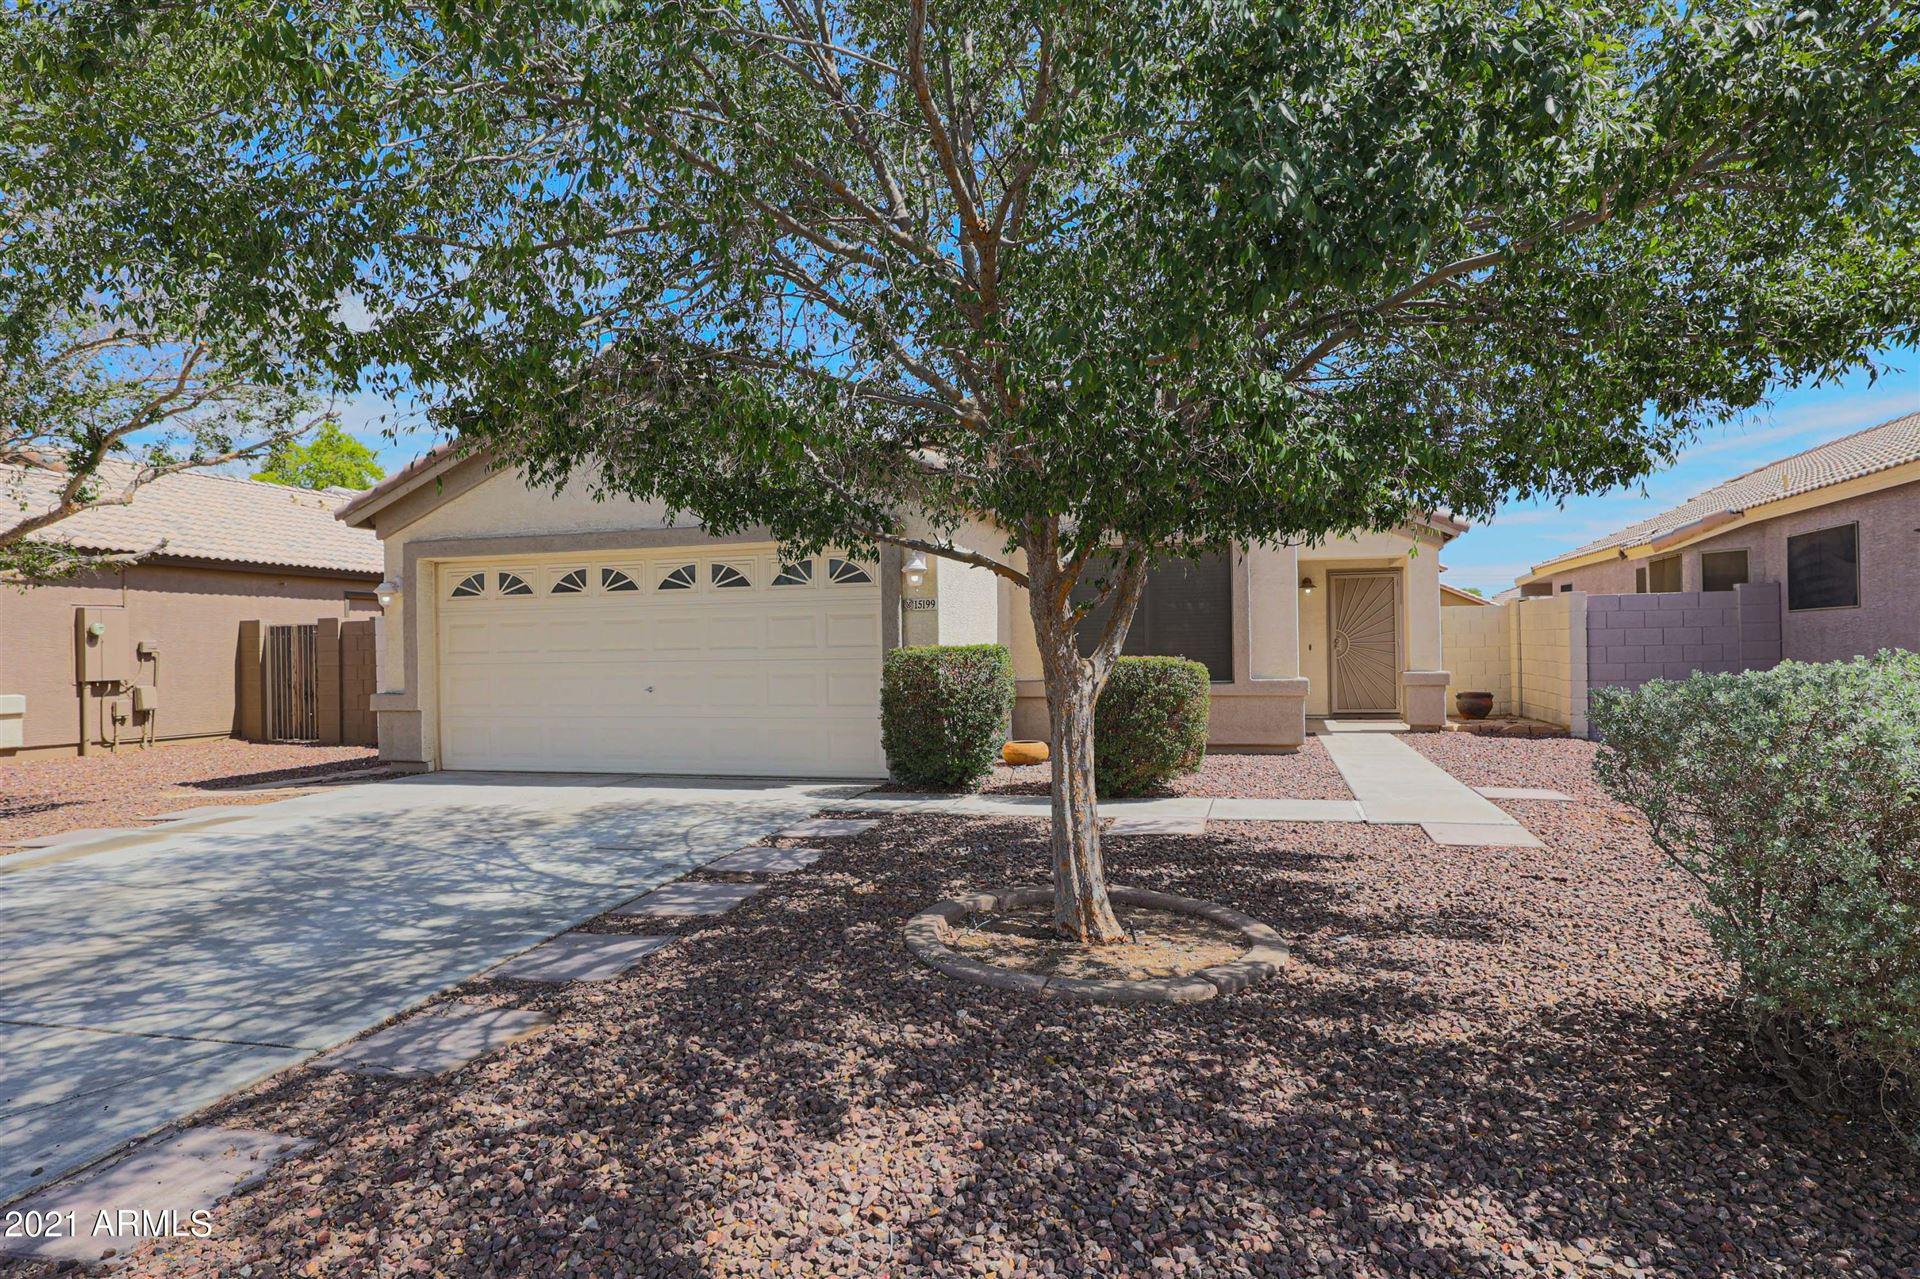 Photo of 15199 W TAYLOR Street, Goodyear, AZ 85338 (MLS # 6248937)